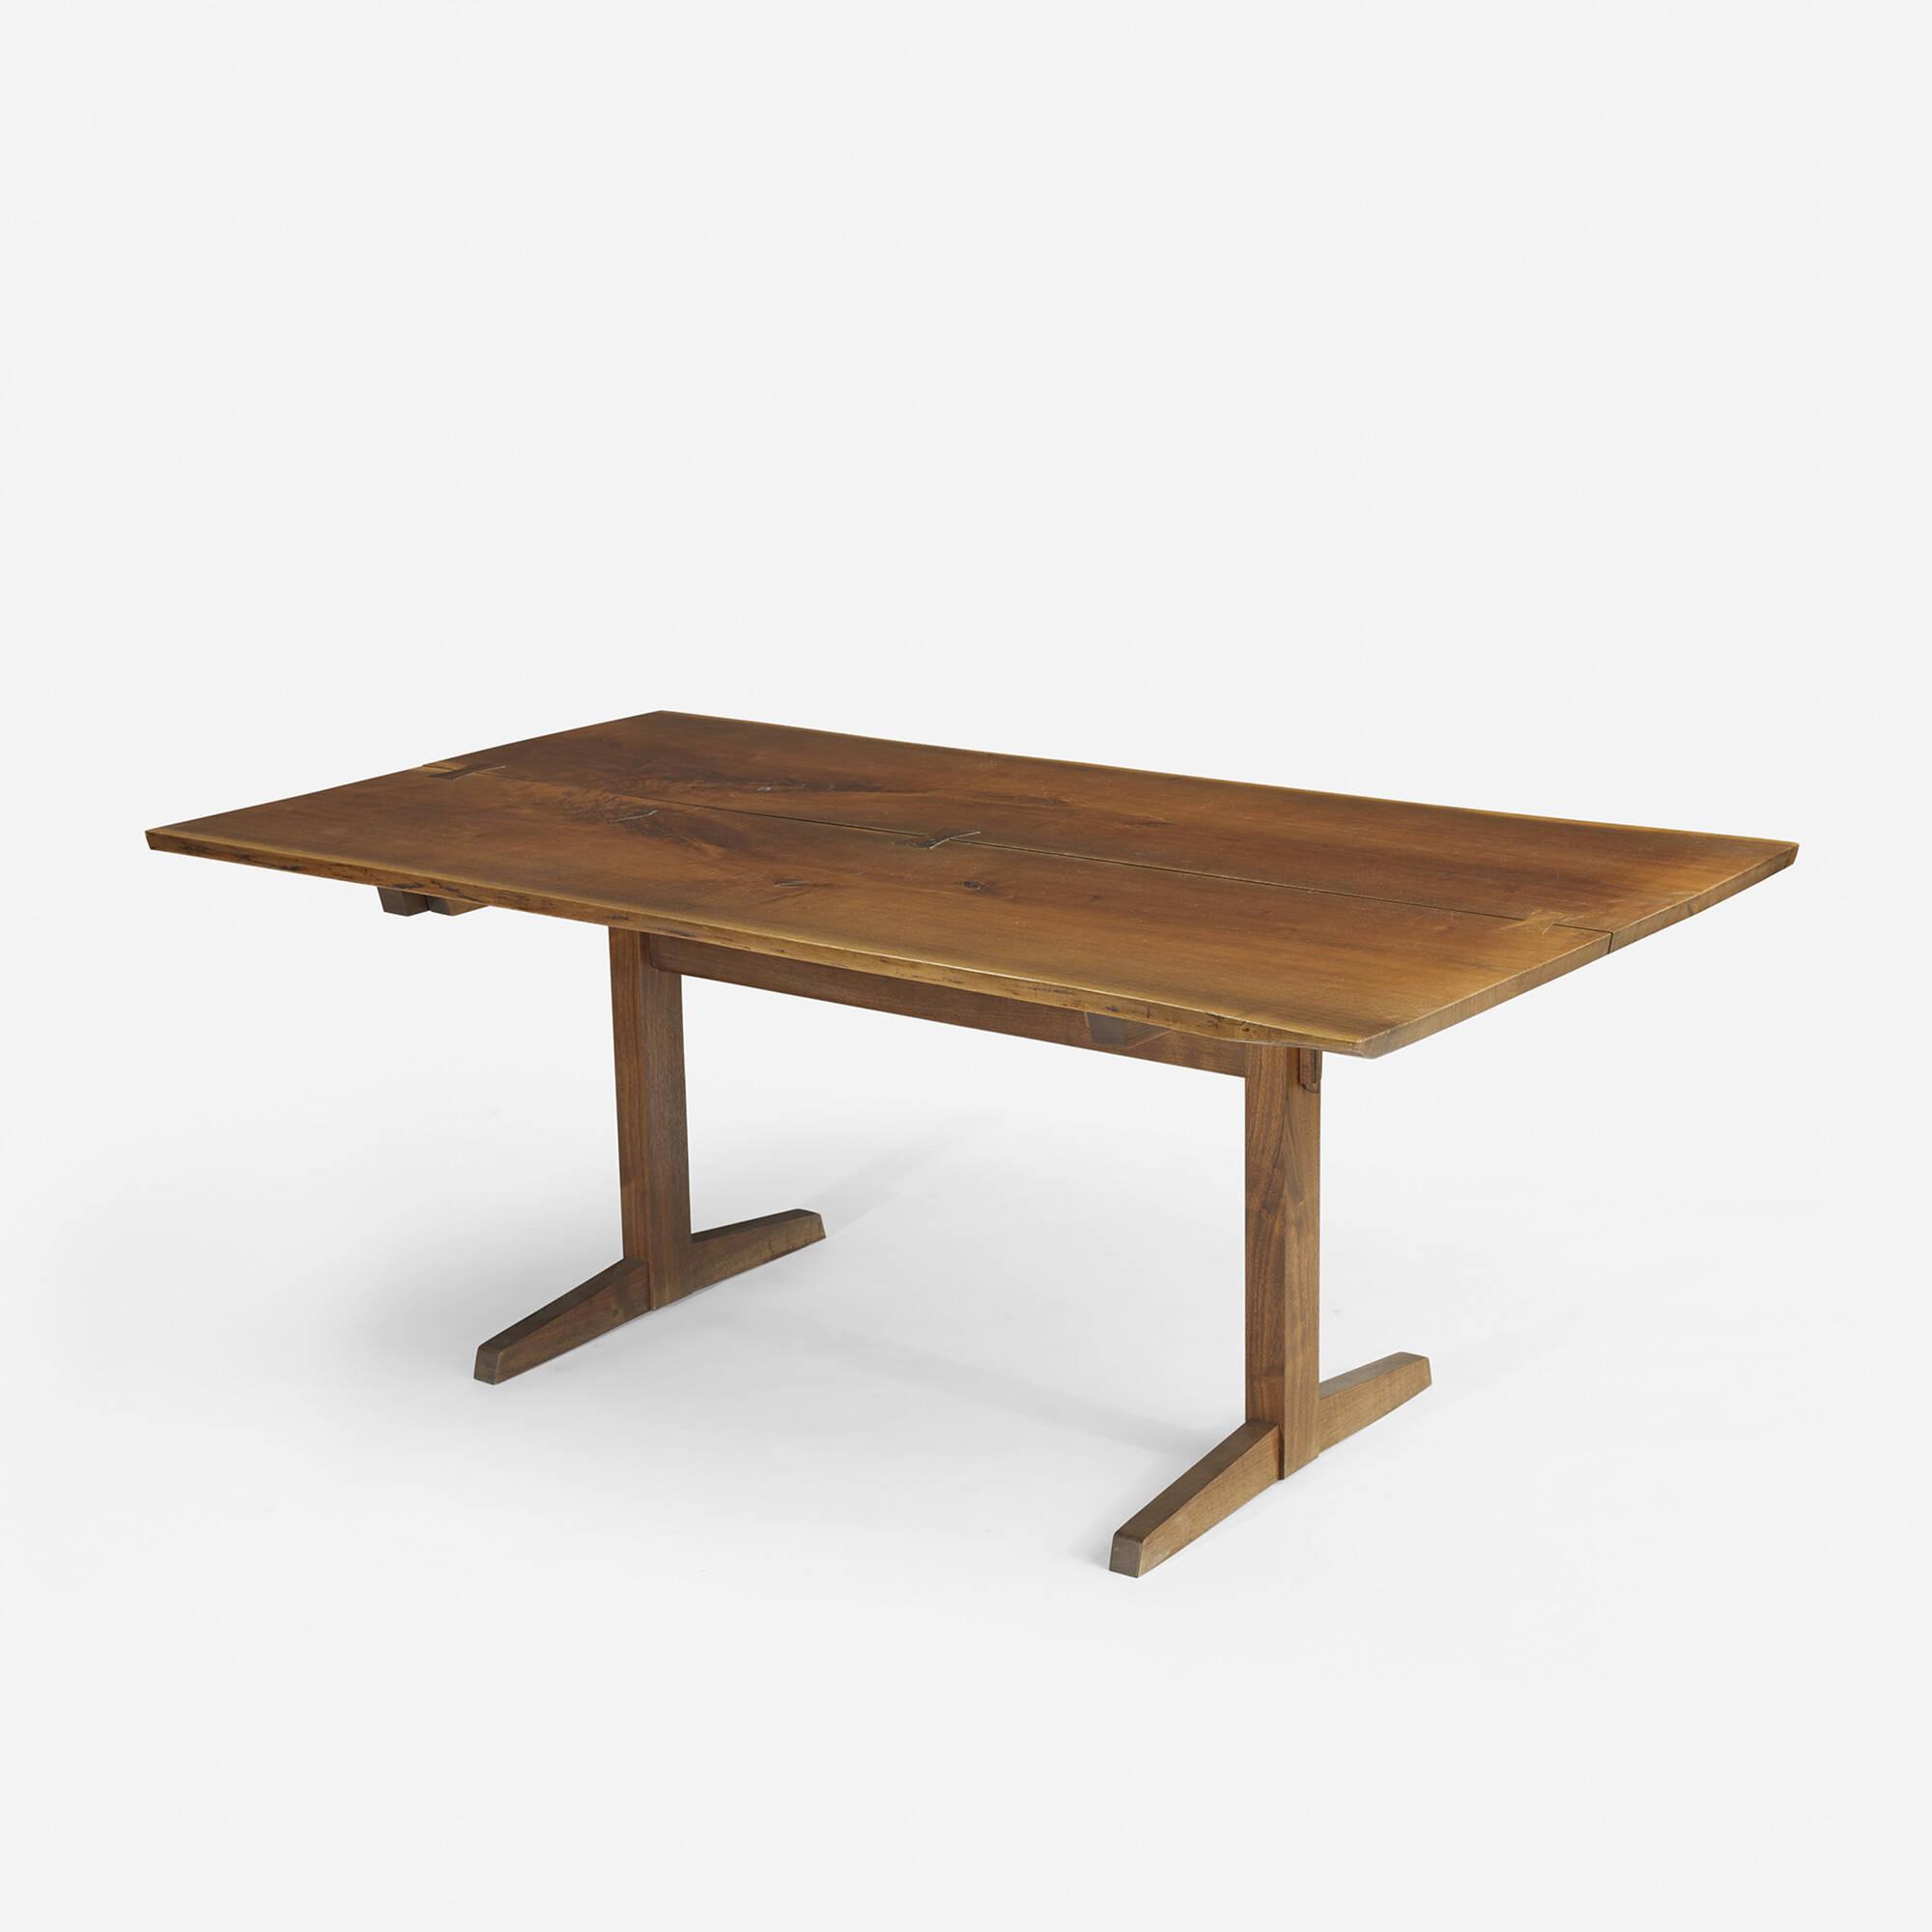 156 george nakashima trestle dining table for Trestle dining table